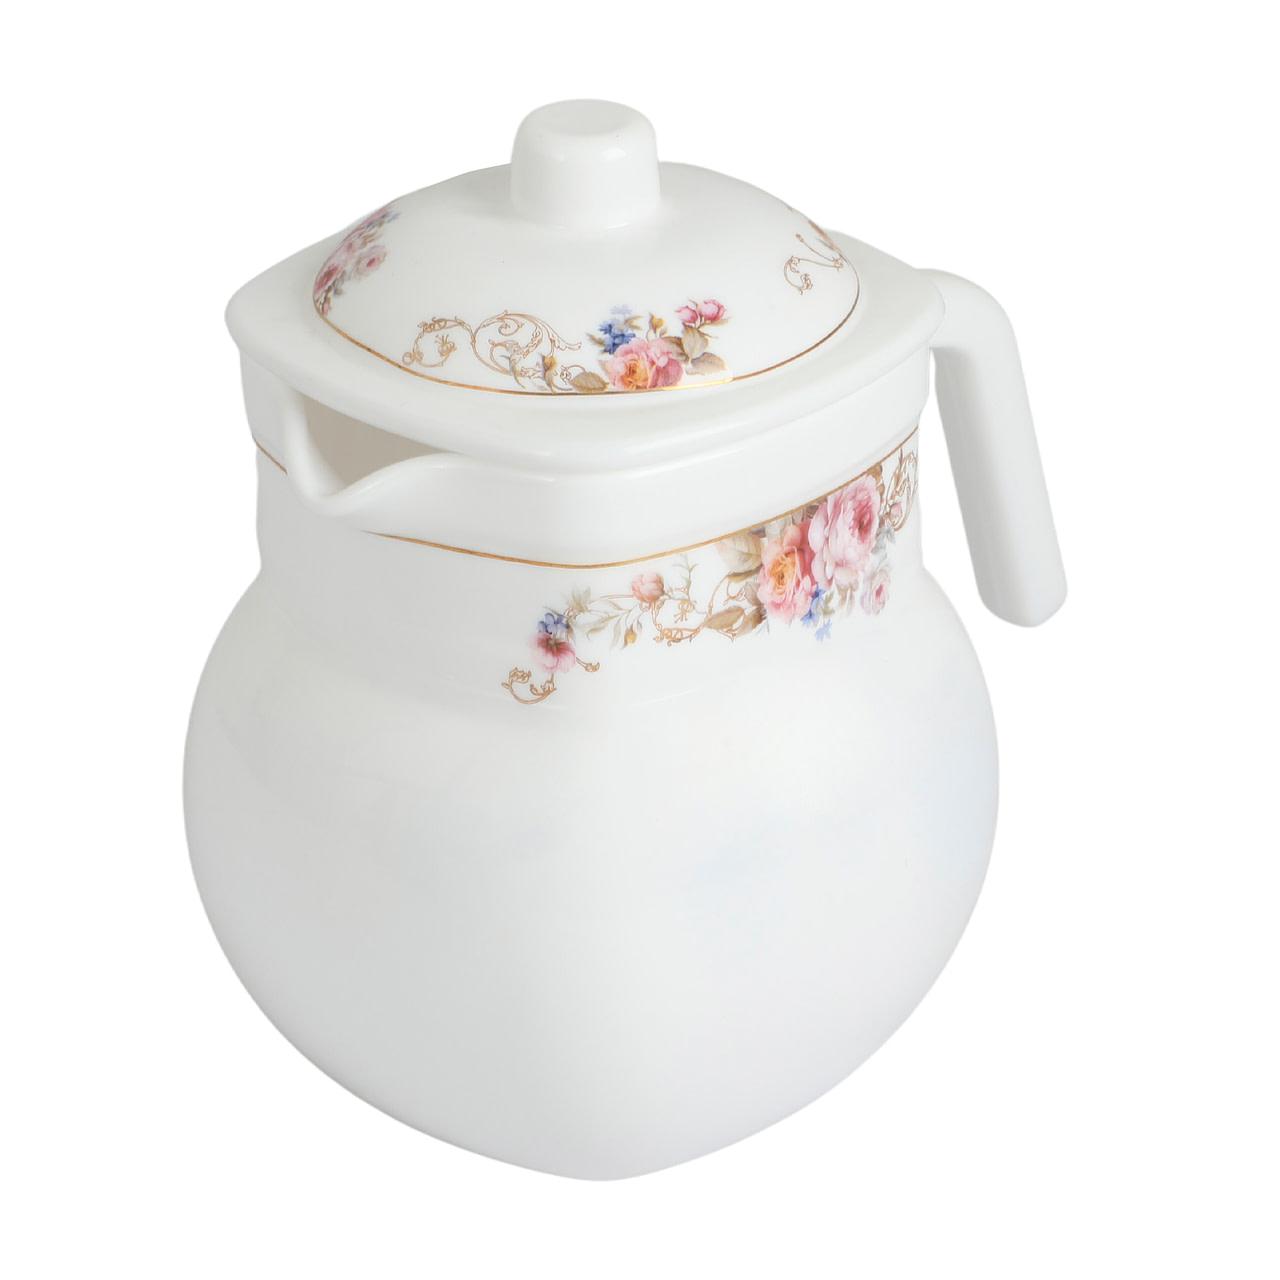 Life Smile Opal ware Tea Pot 1.5 Liter